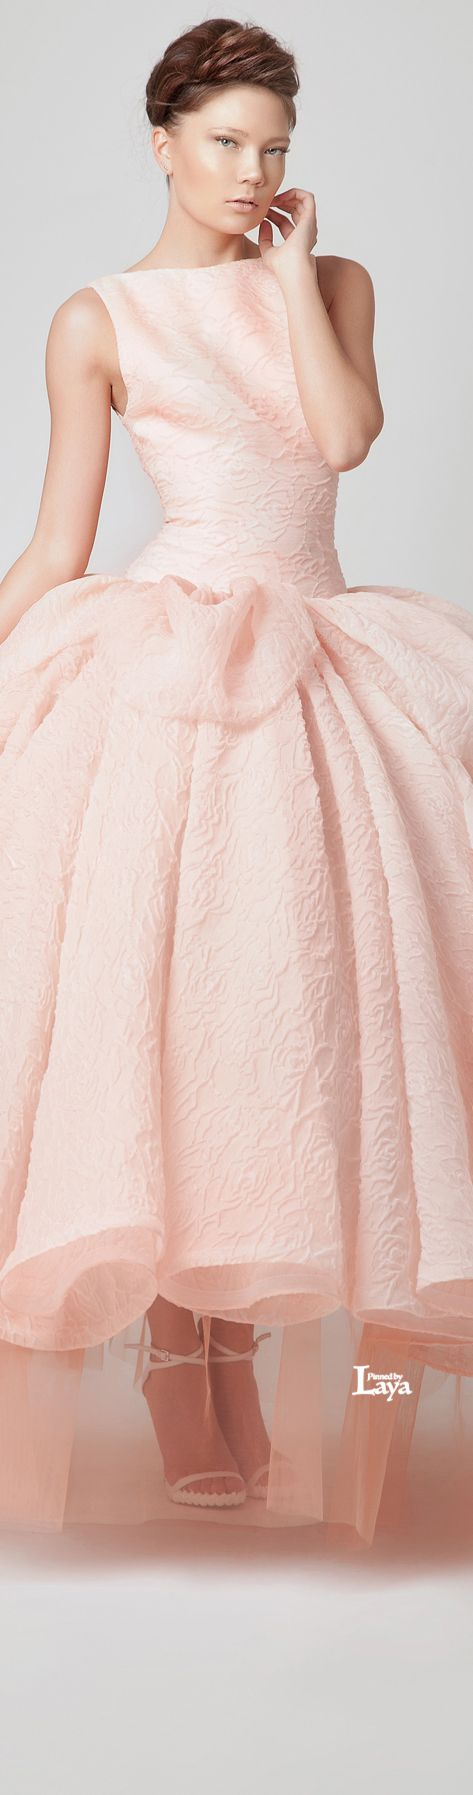 Blush Wedding Colors, dusty rose, pastels, pink wedding | Blush ...